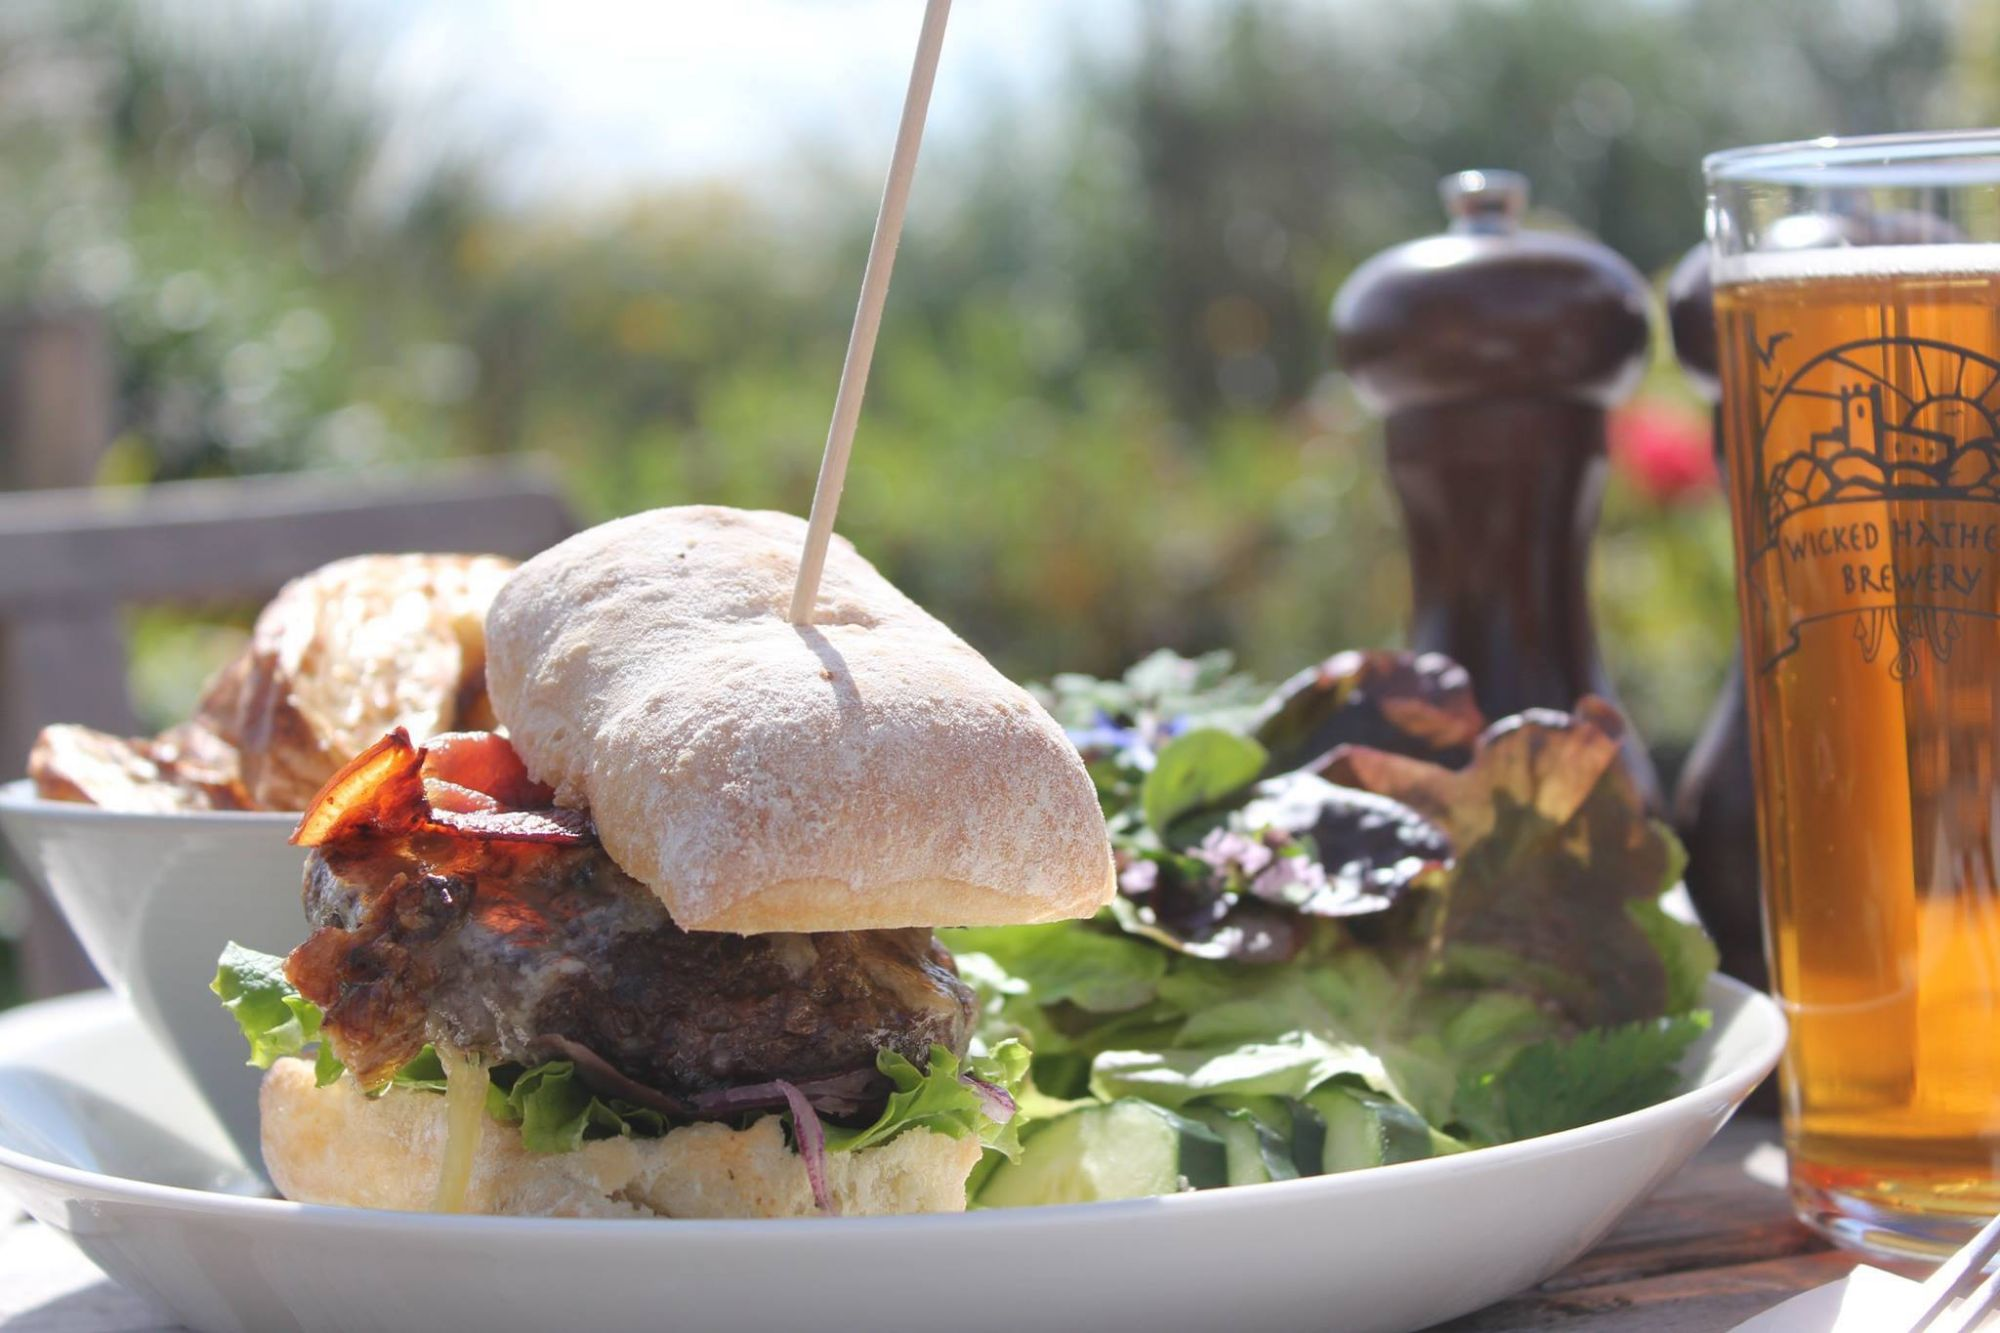 Burger in the cafe at Oakley Grange